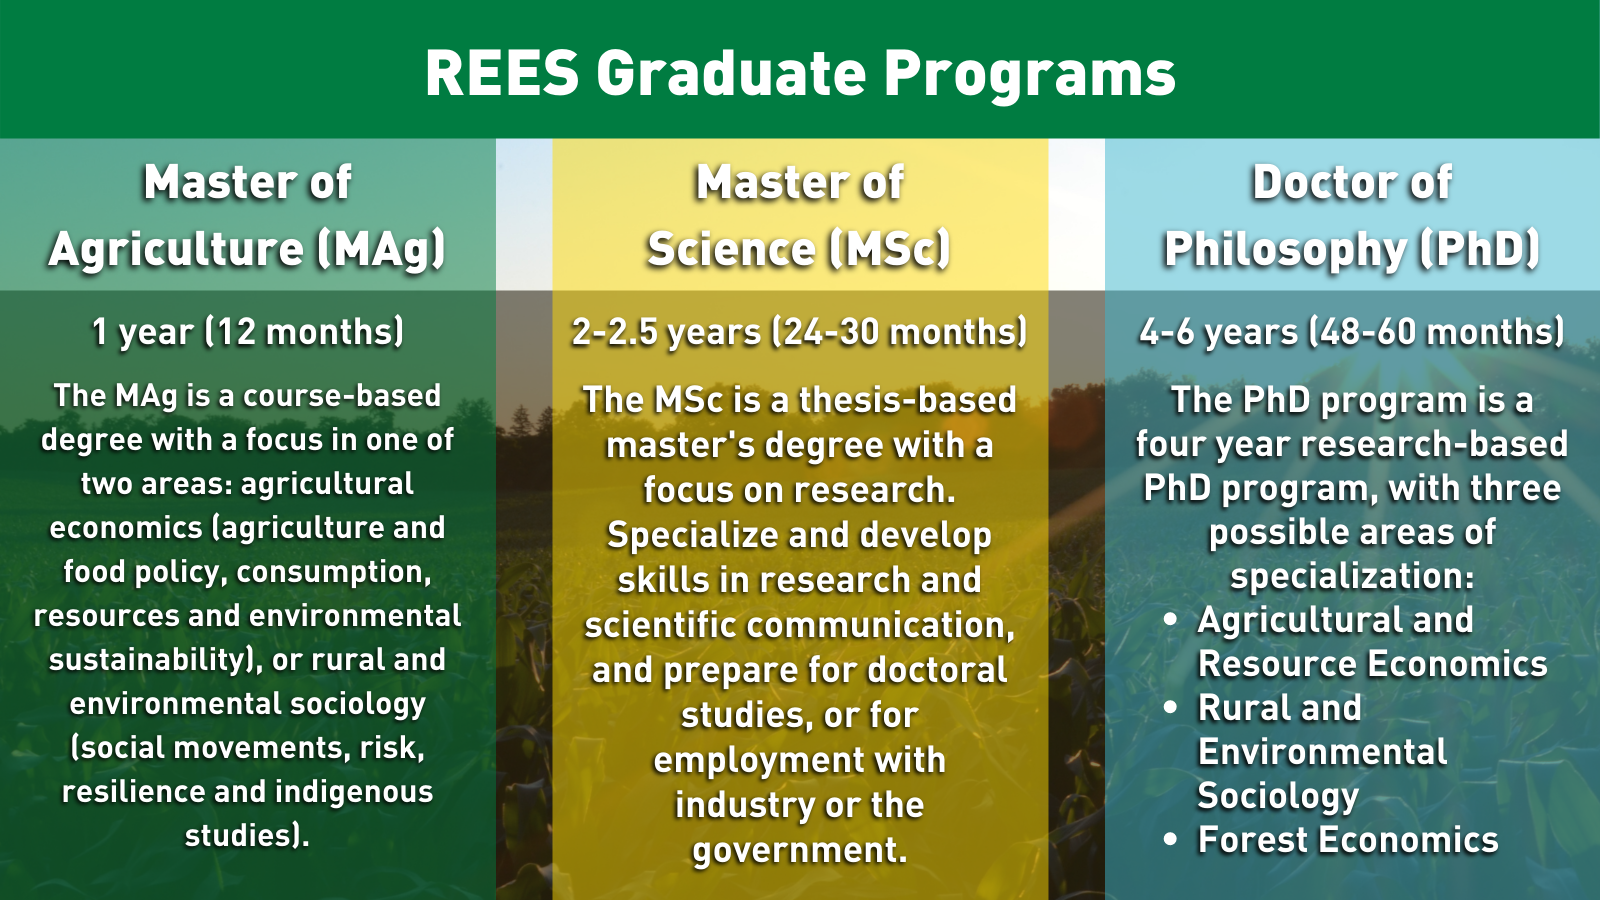 rees-graduate-programs-2020-banner-v3-2.png